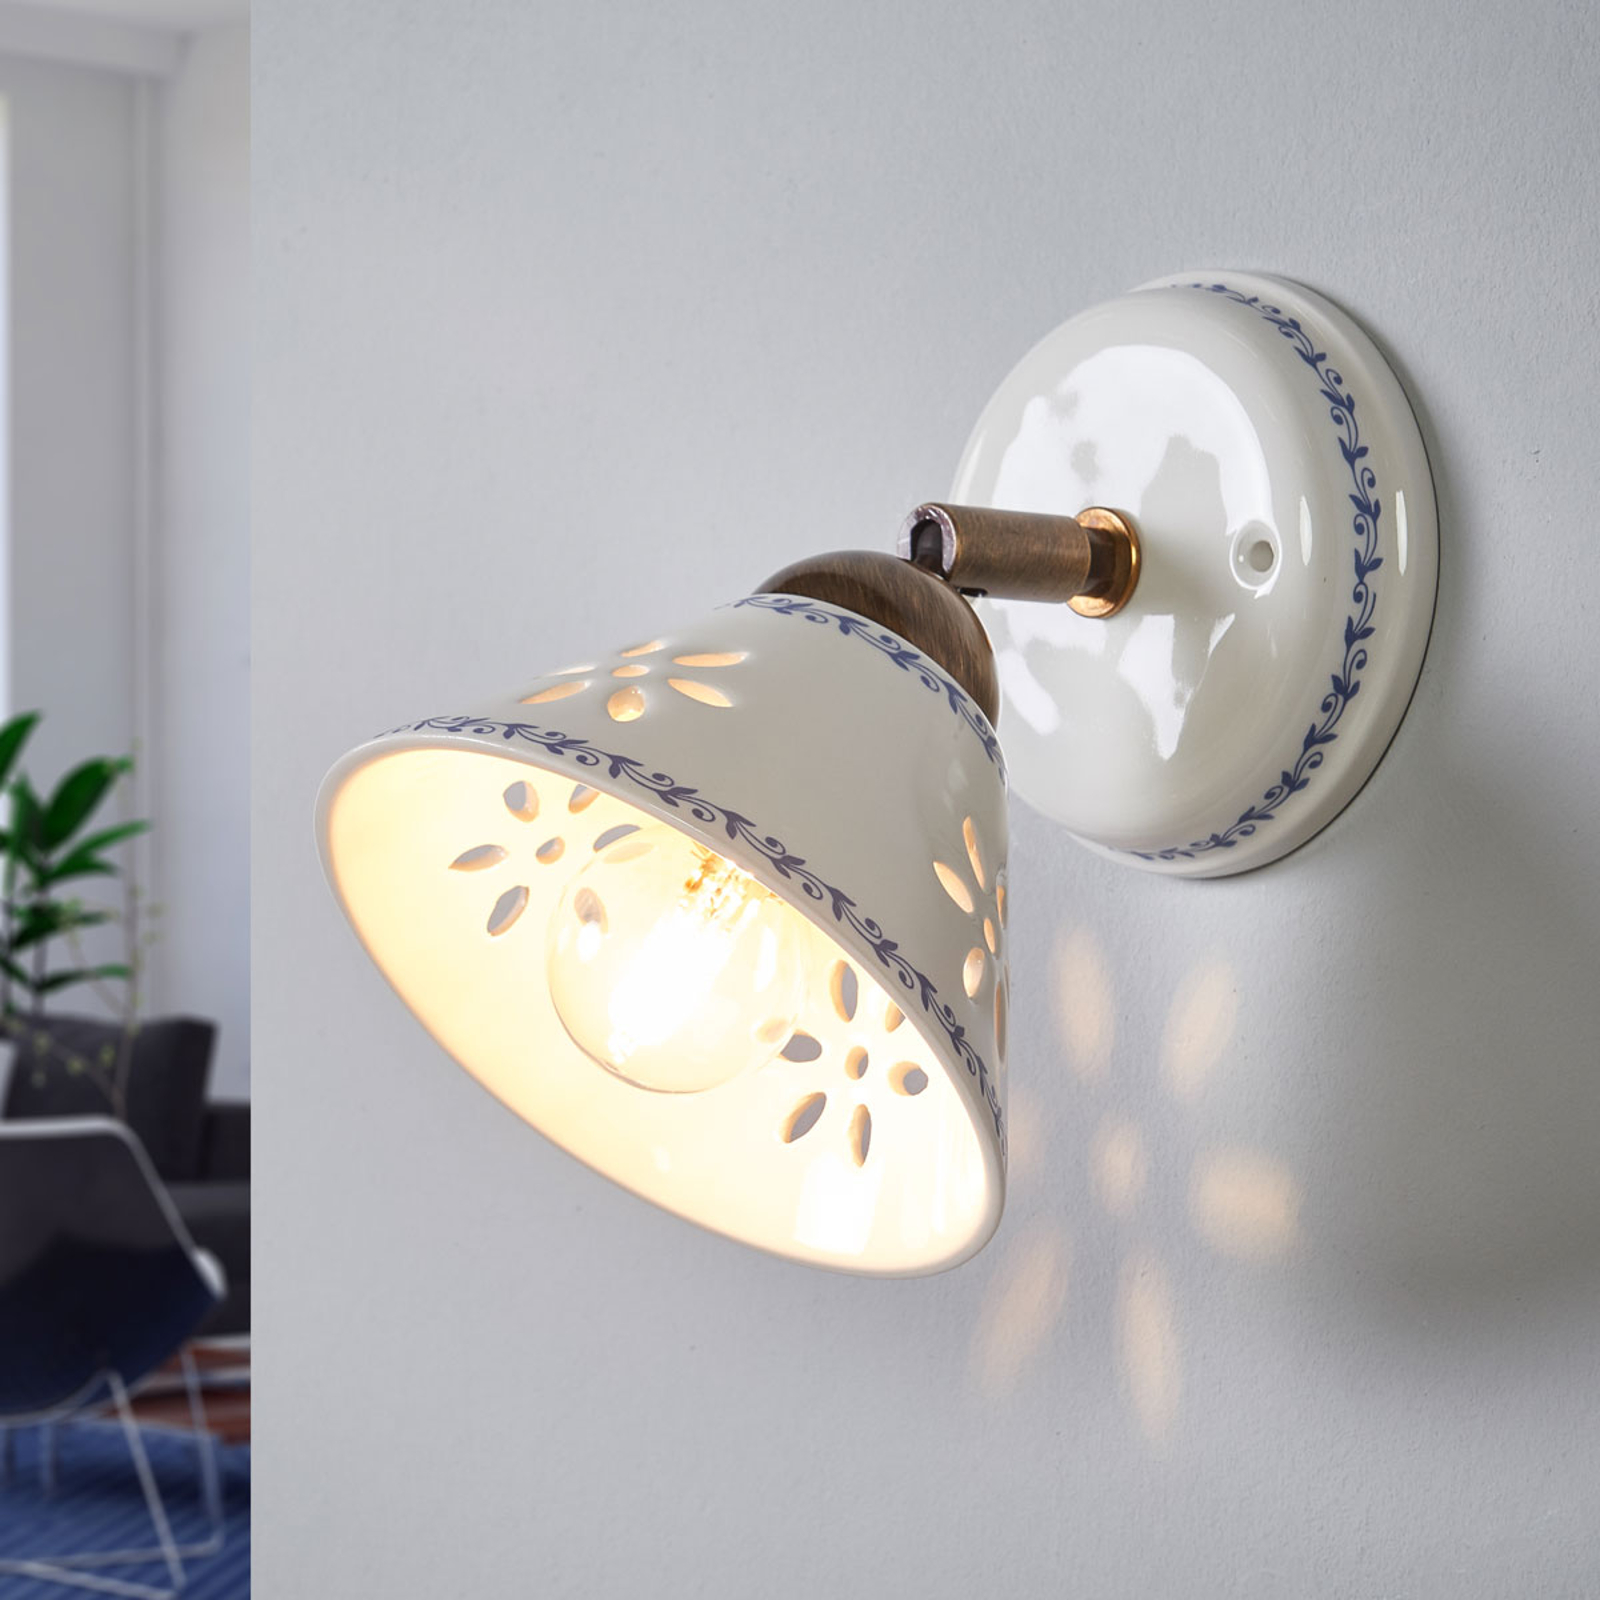 NONNA wall light, made of white ceramic_2013025_1